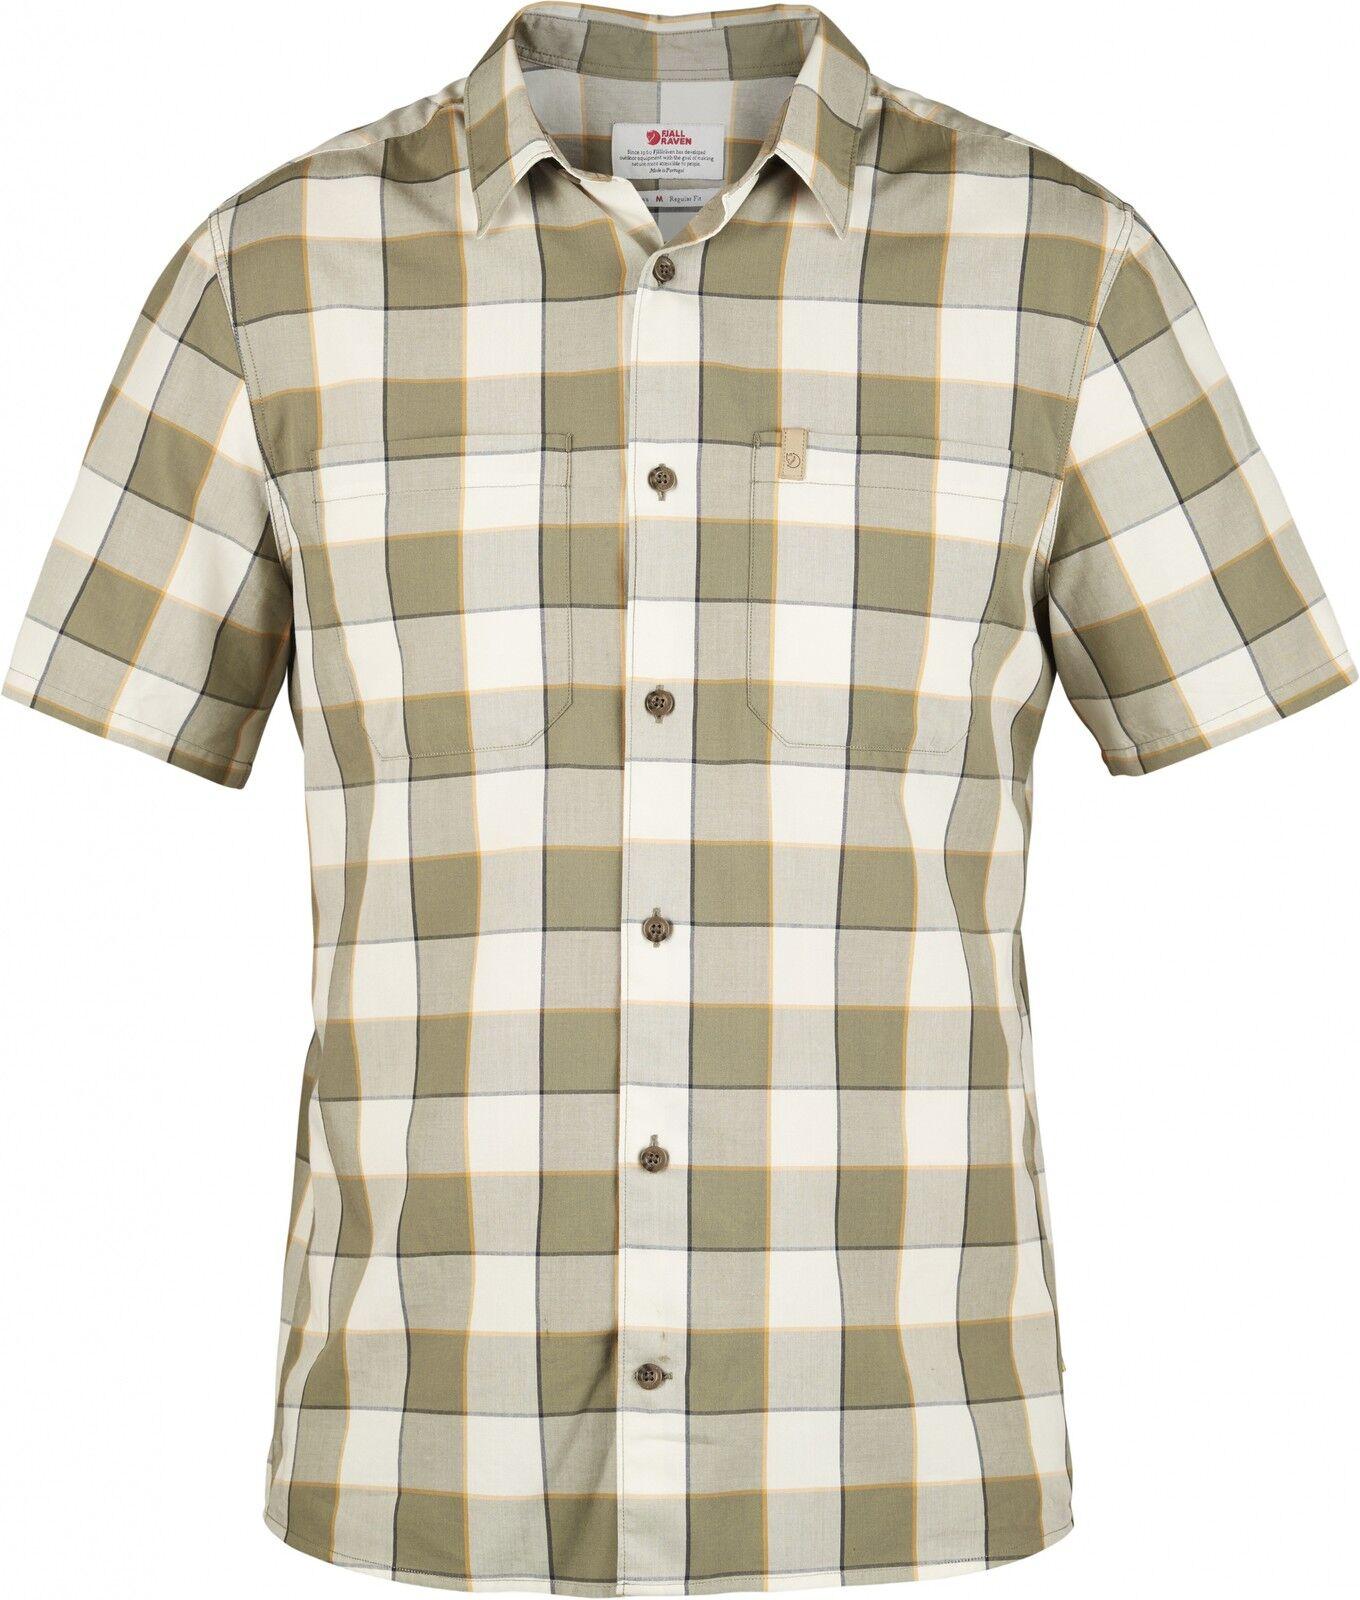 Fjällräven Fjällräven Fjällräven High Coast Big Check Shirt SS Outdoorhemd (chalk-Weiß) 750efb